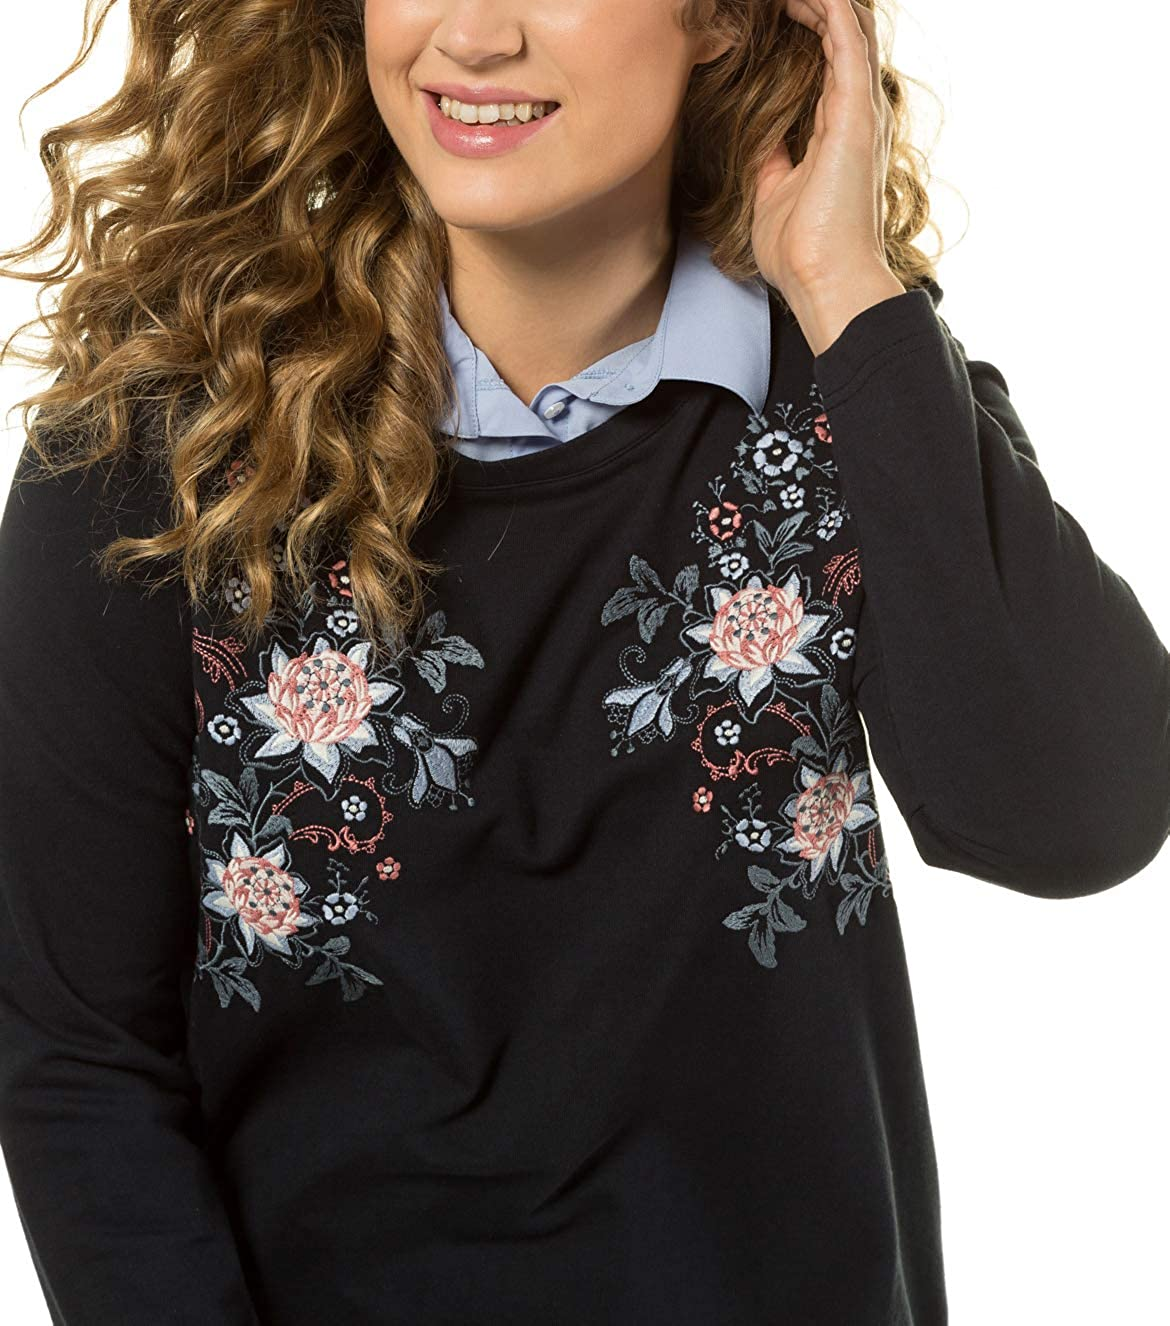 ULLA POPKEN Sweatshirt Hemdblusen Einsatz Stickerei Felpa Donna